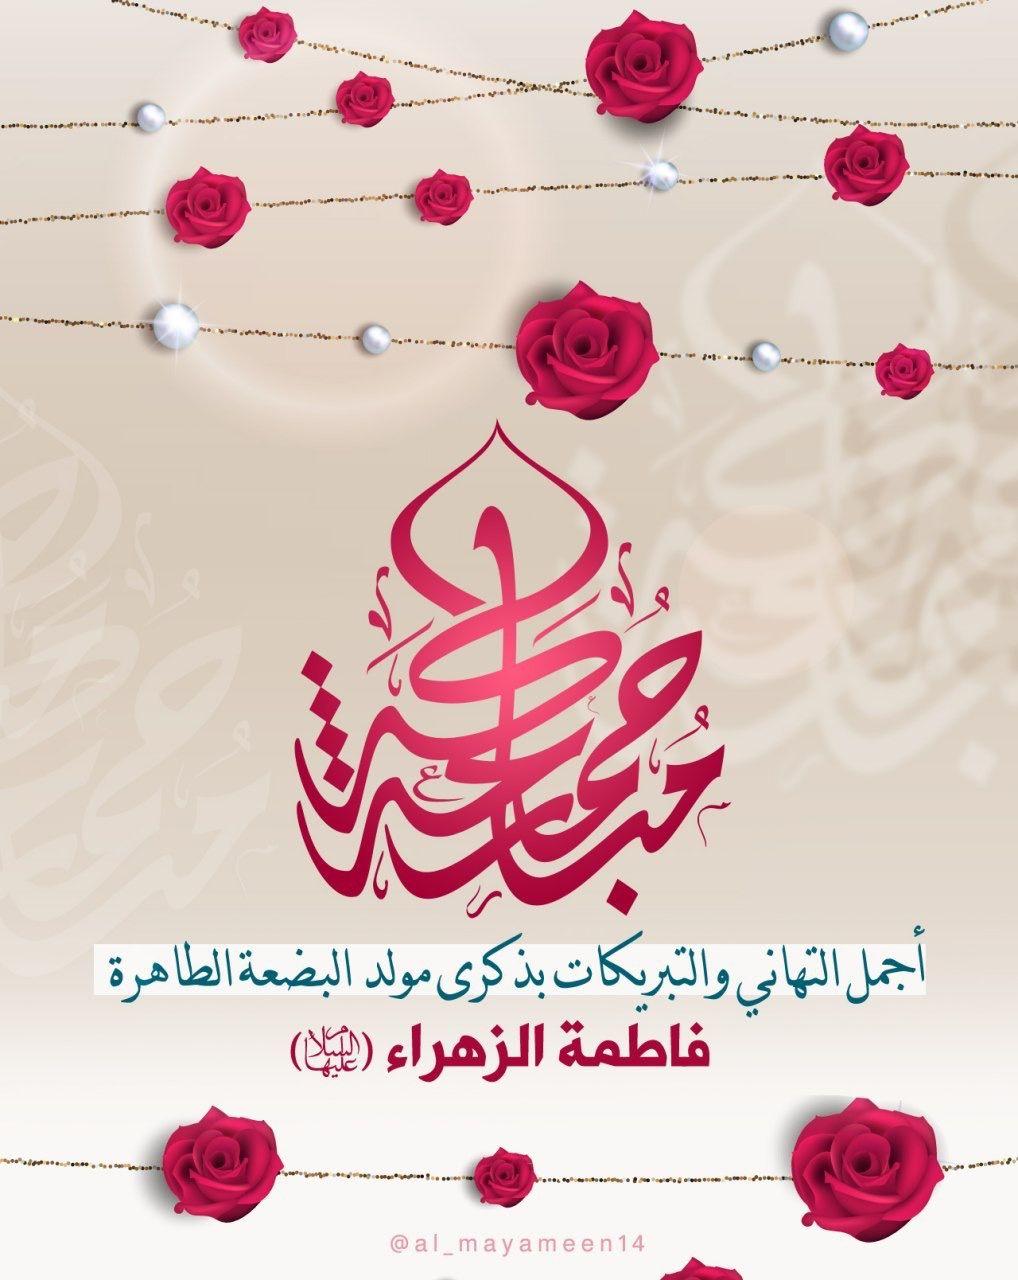 Pin By Ahmed Alabdullah On جمعة مباركة Calligraphy Art Islam Jumma Mubarak